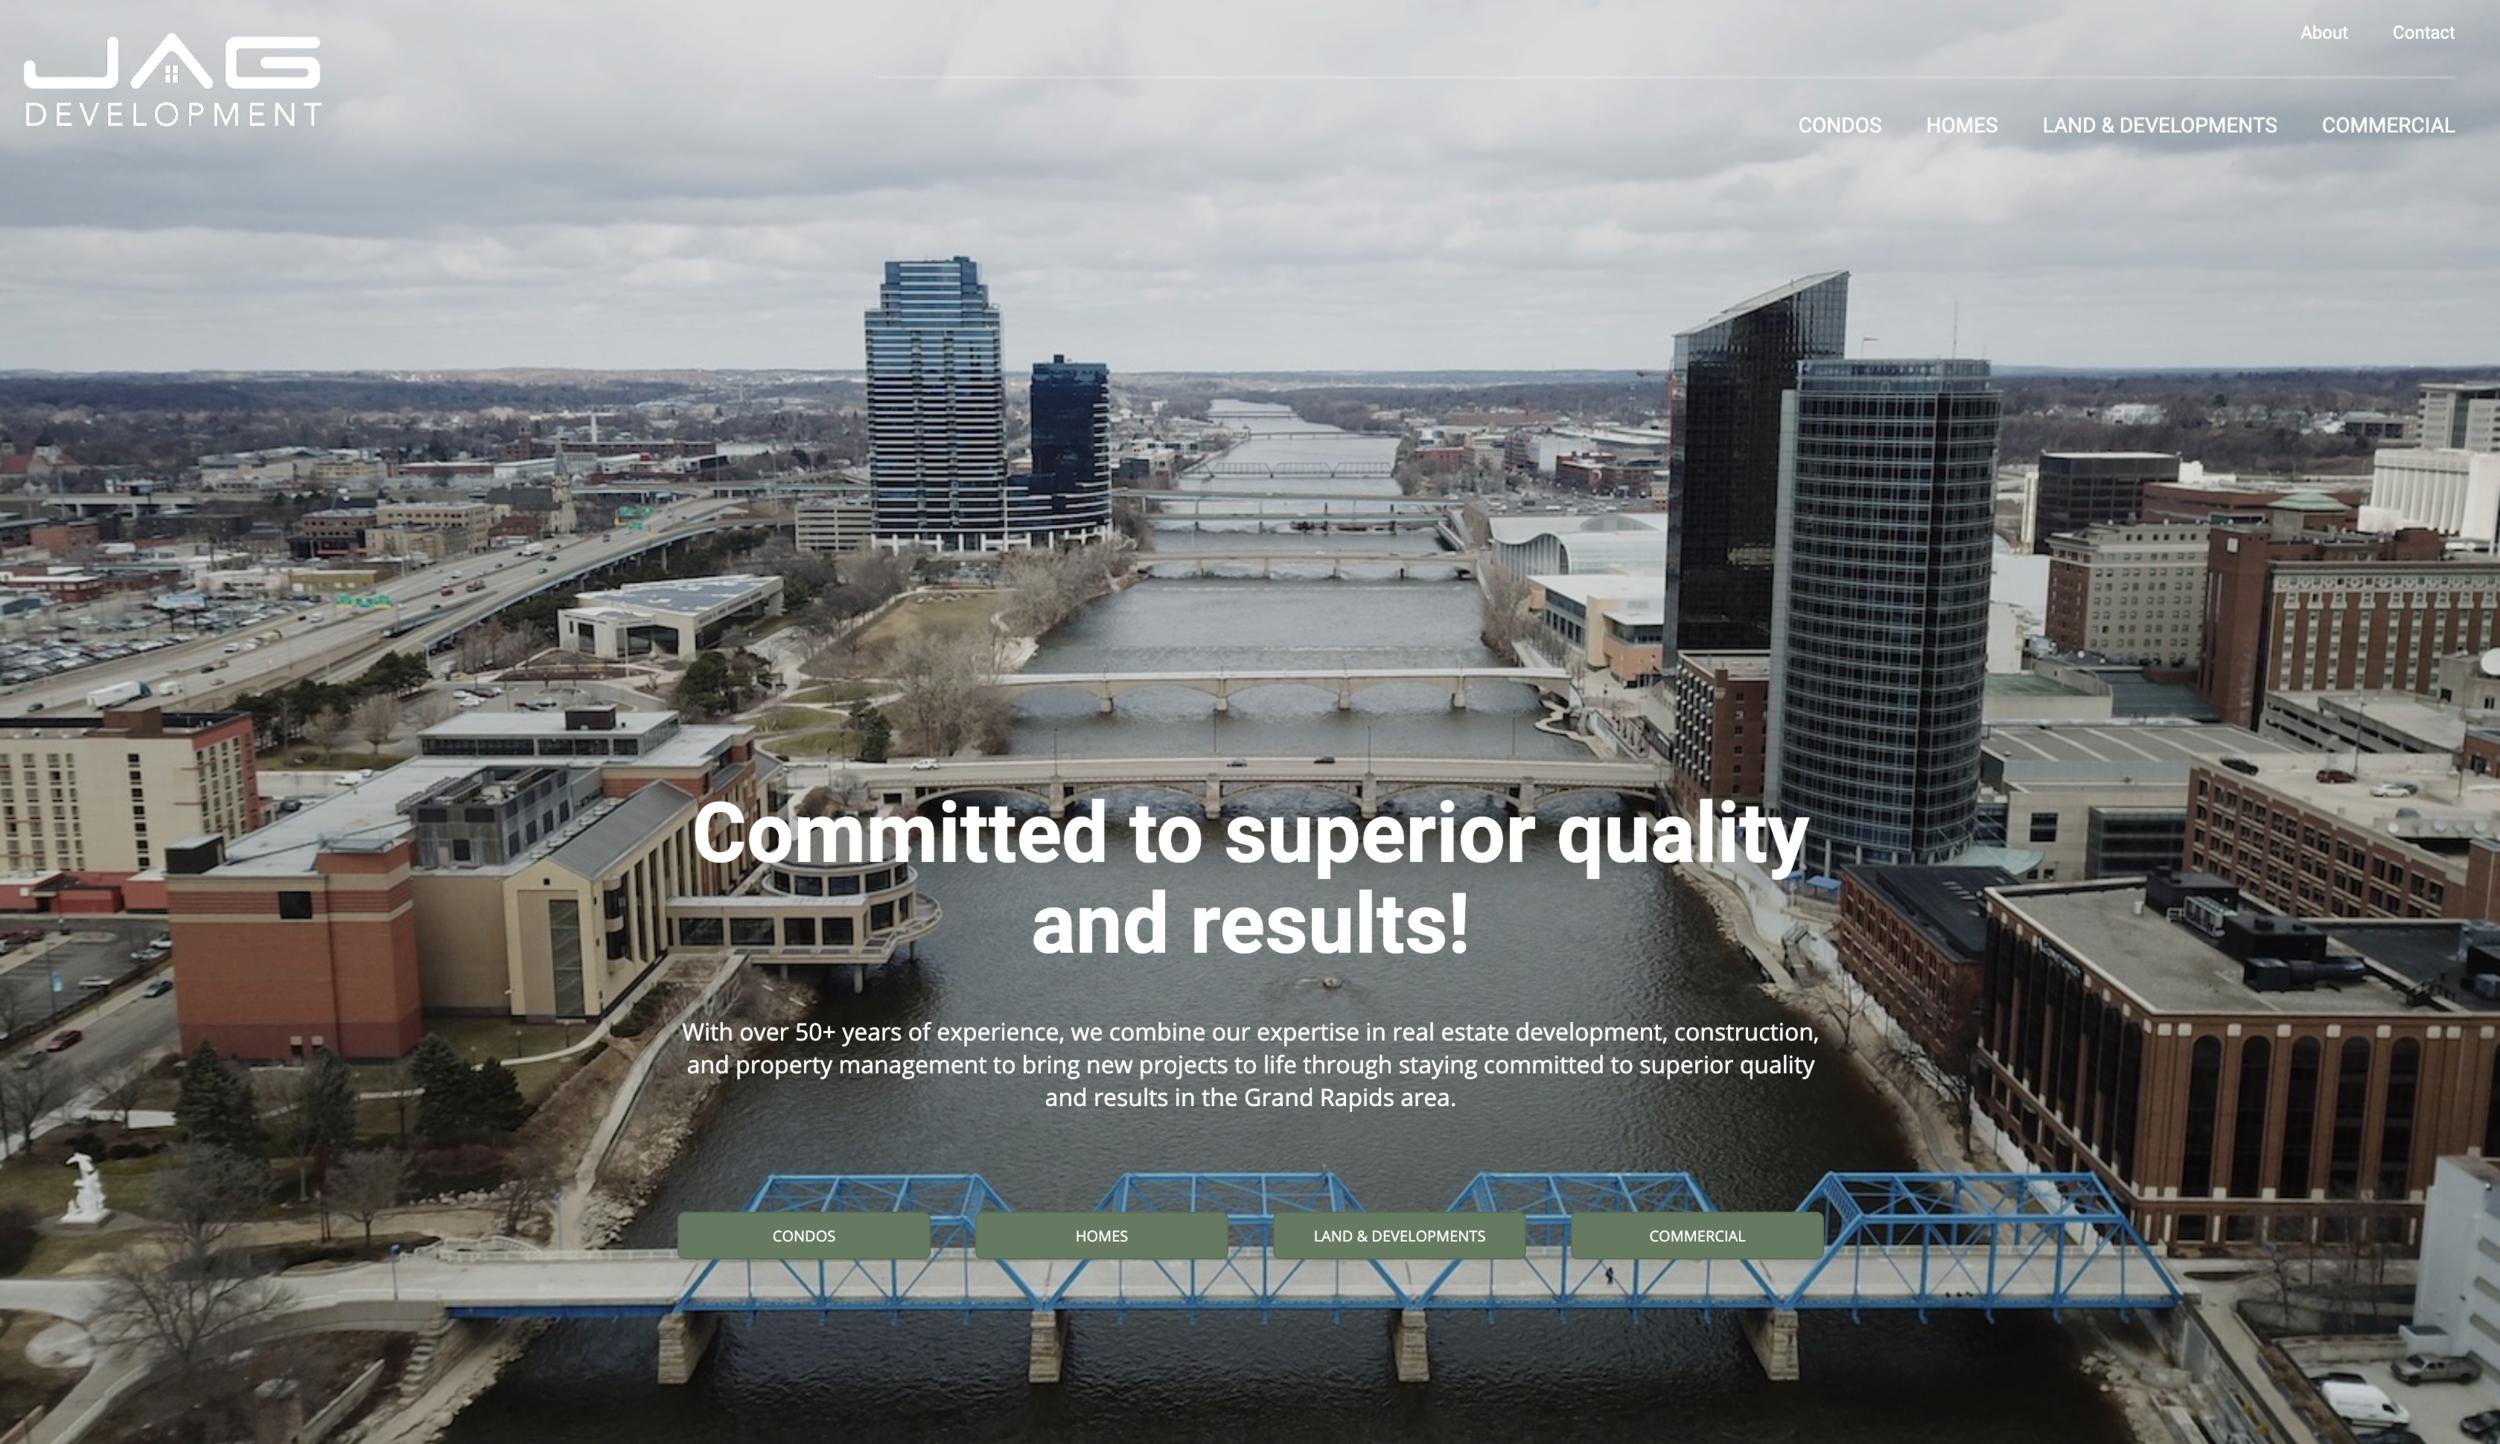 JAG Development Grand Rapids, Michigan Website